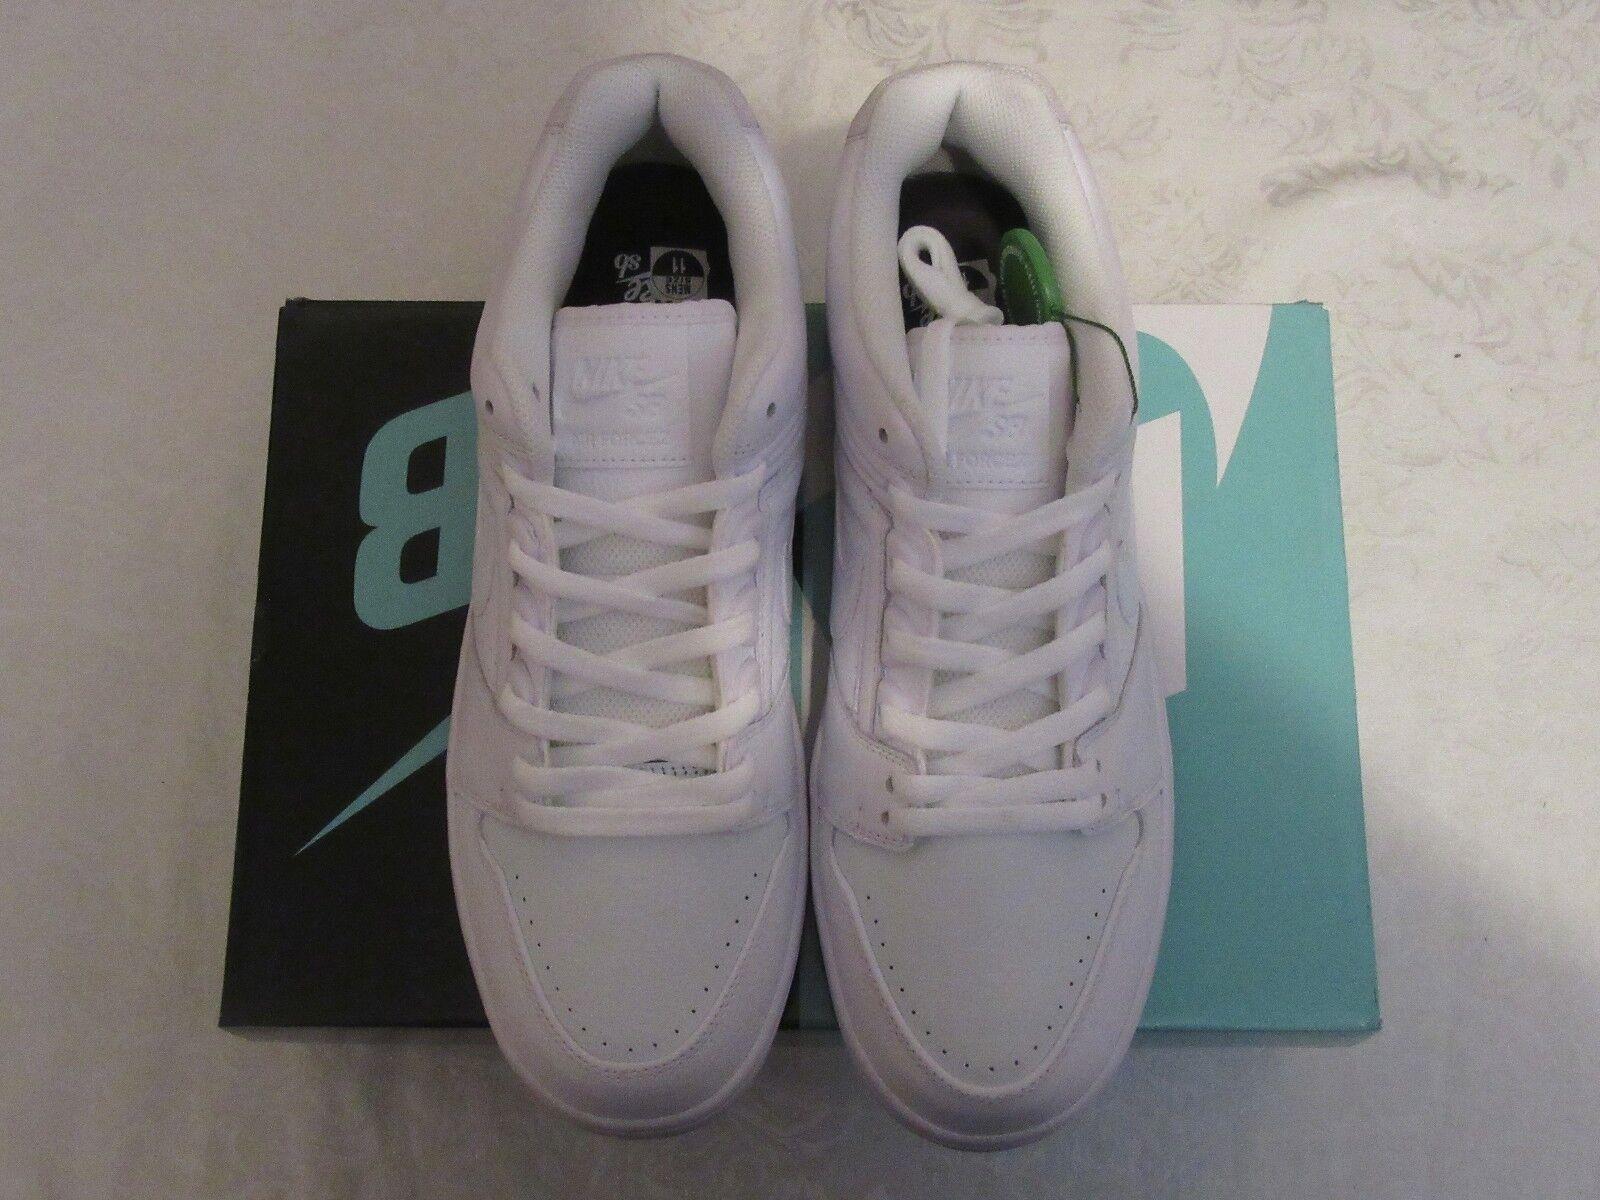 Nike SB Air Force II 2 Low QS White Blue Kevin Bradley AO0298 114 Comfortable